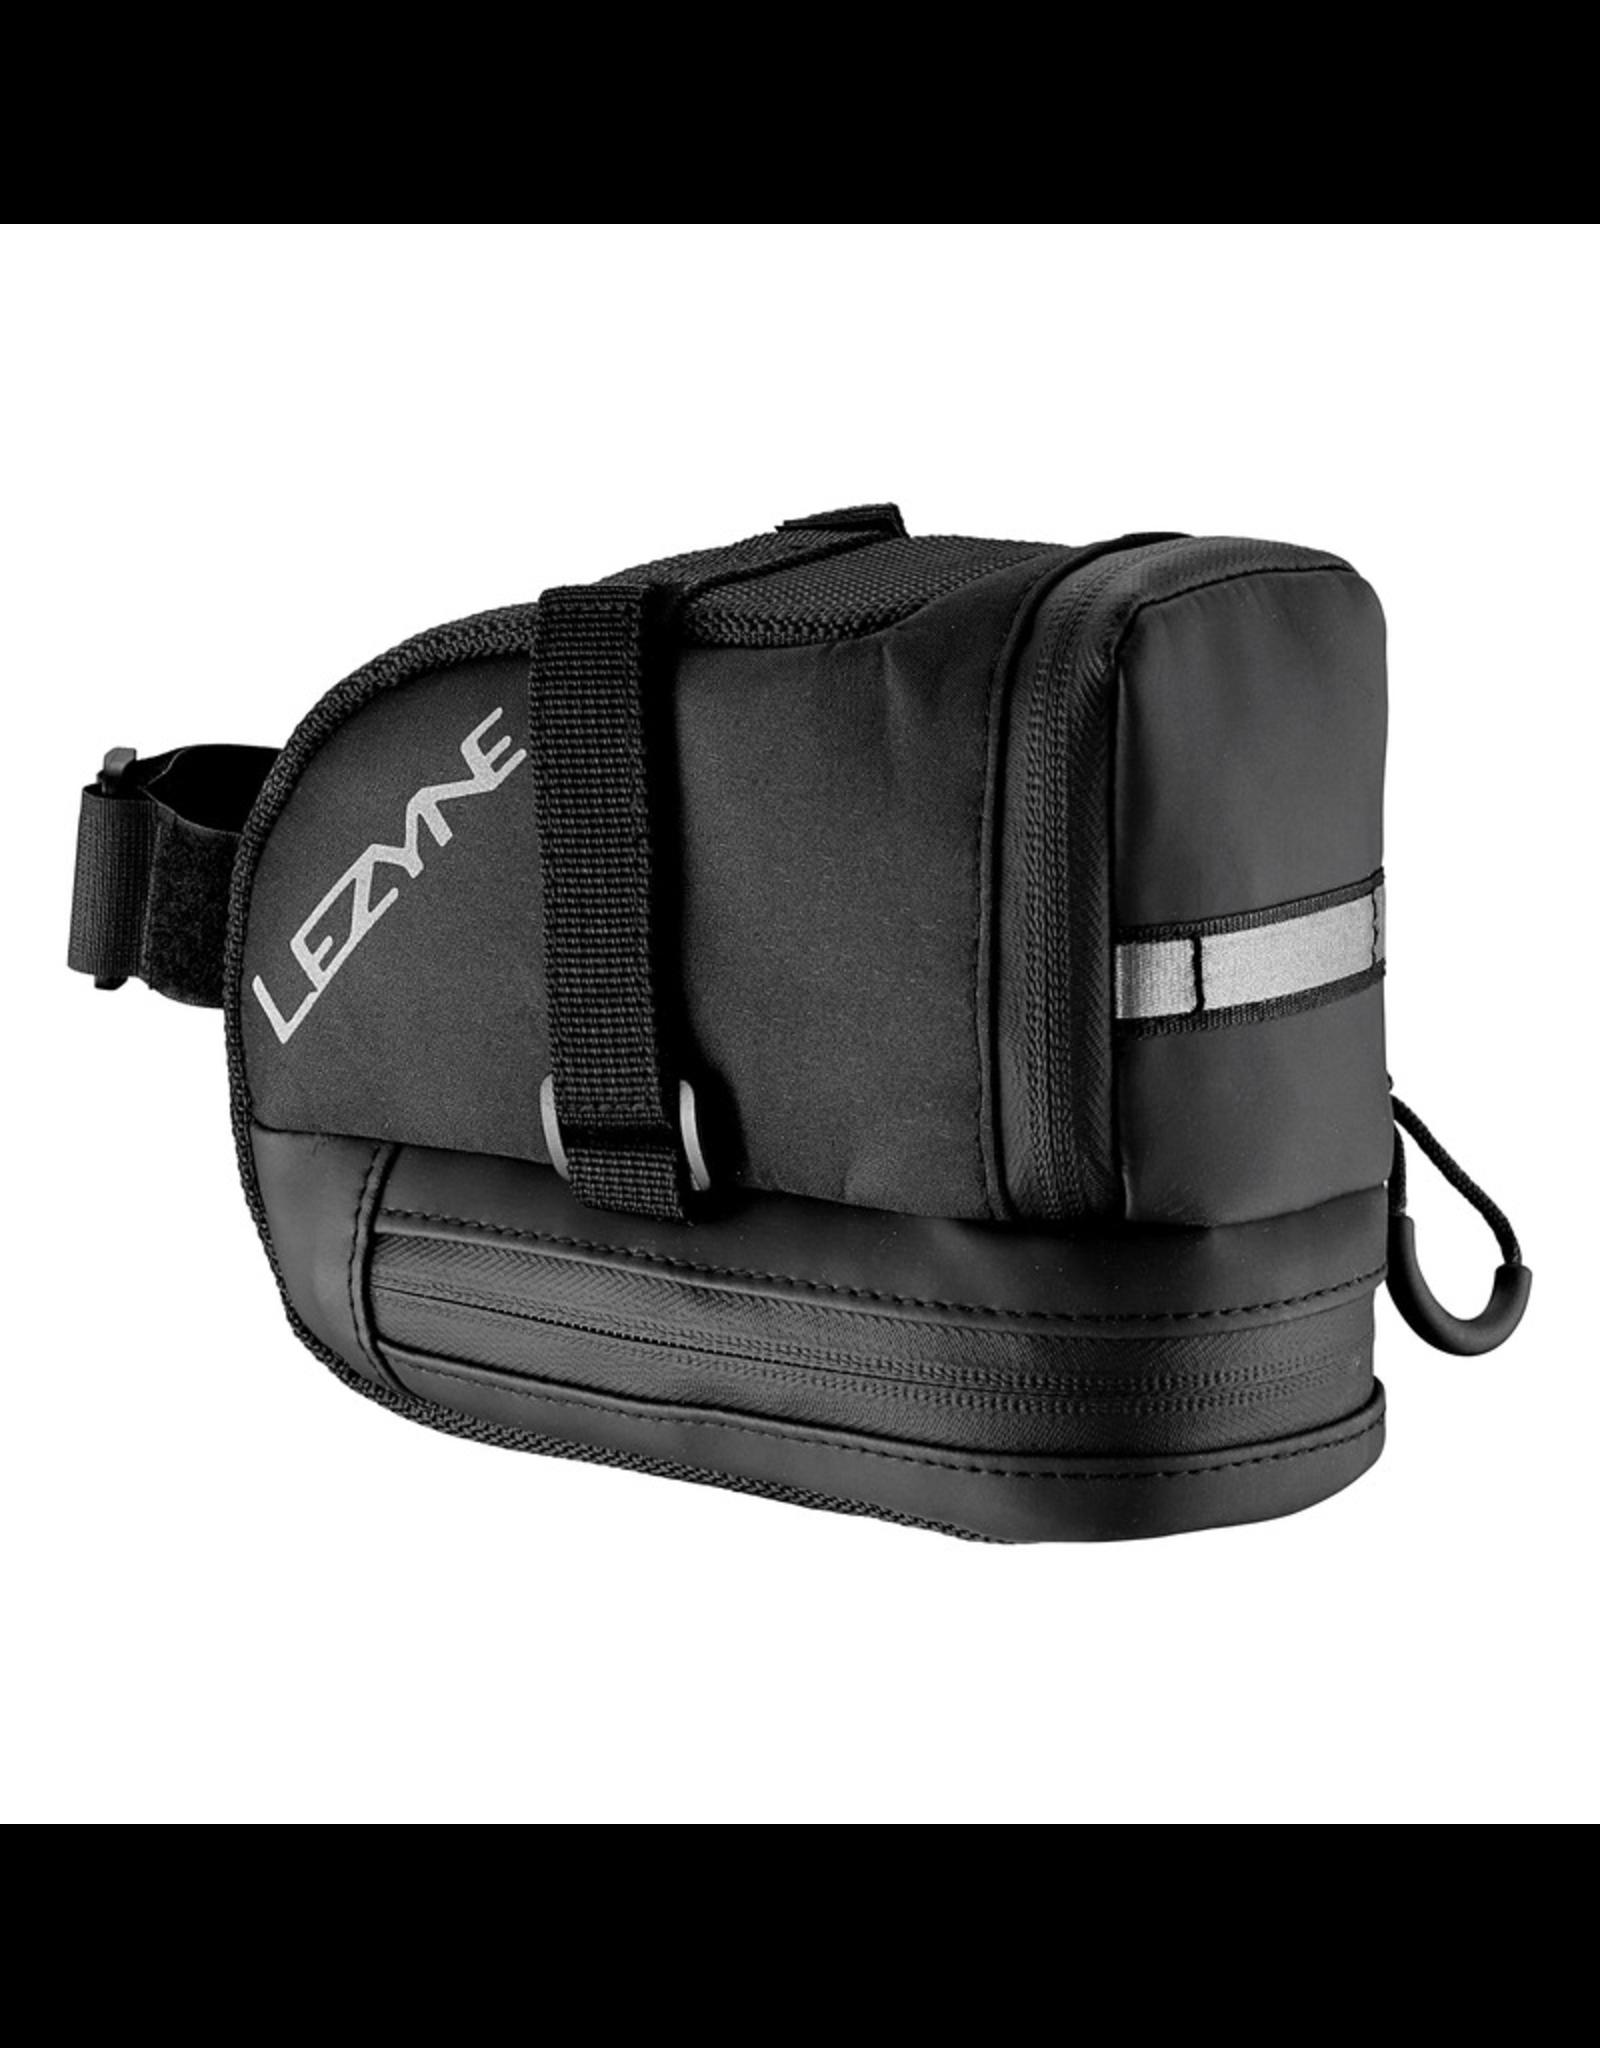 LEZYNE LEZYNE L-CADDY BLACK SADDLE BAG